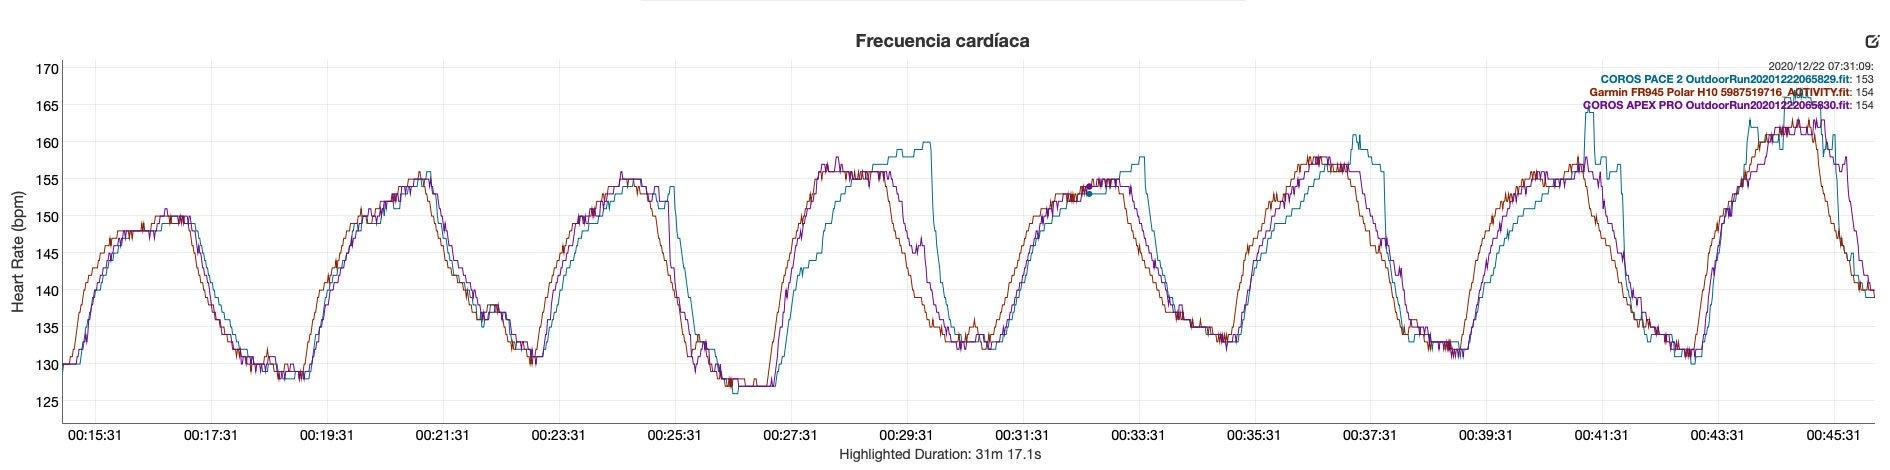 COROS PACE 2 - Comparativa sensor de pulso óptico